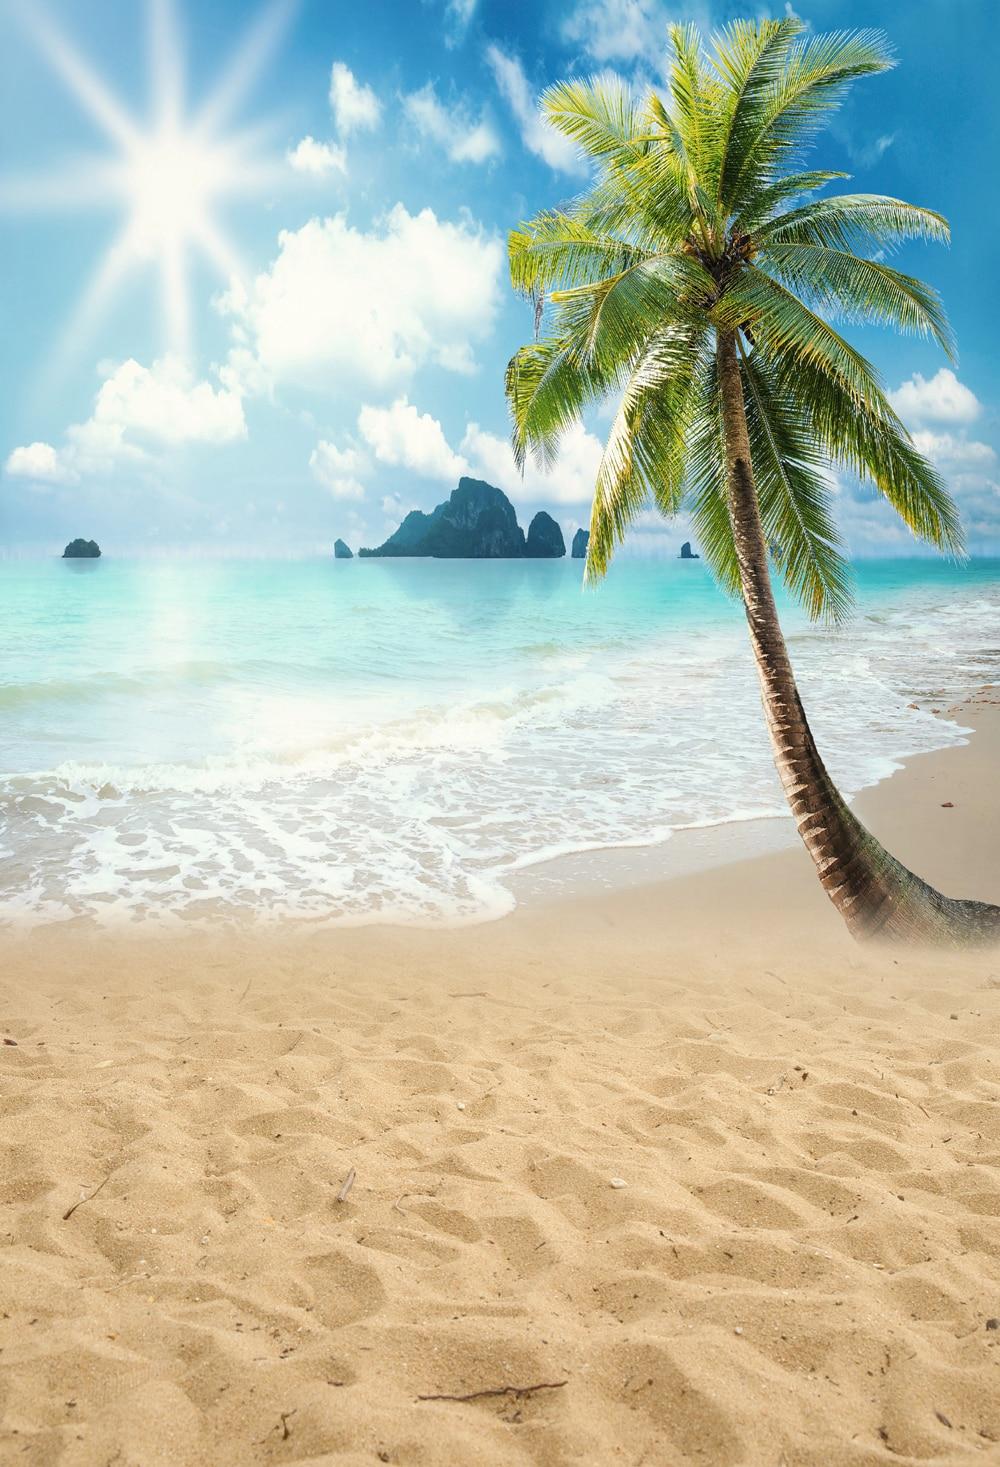 HUAYI Beach Scenery Backgrounds Photo Backdrop Wedding